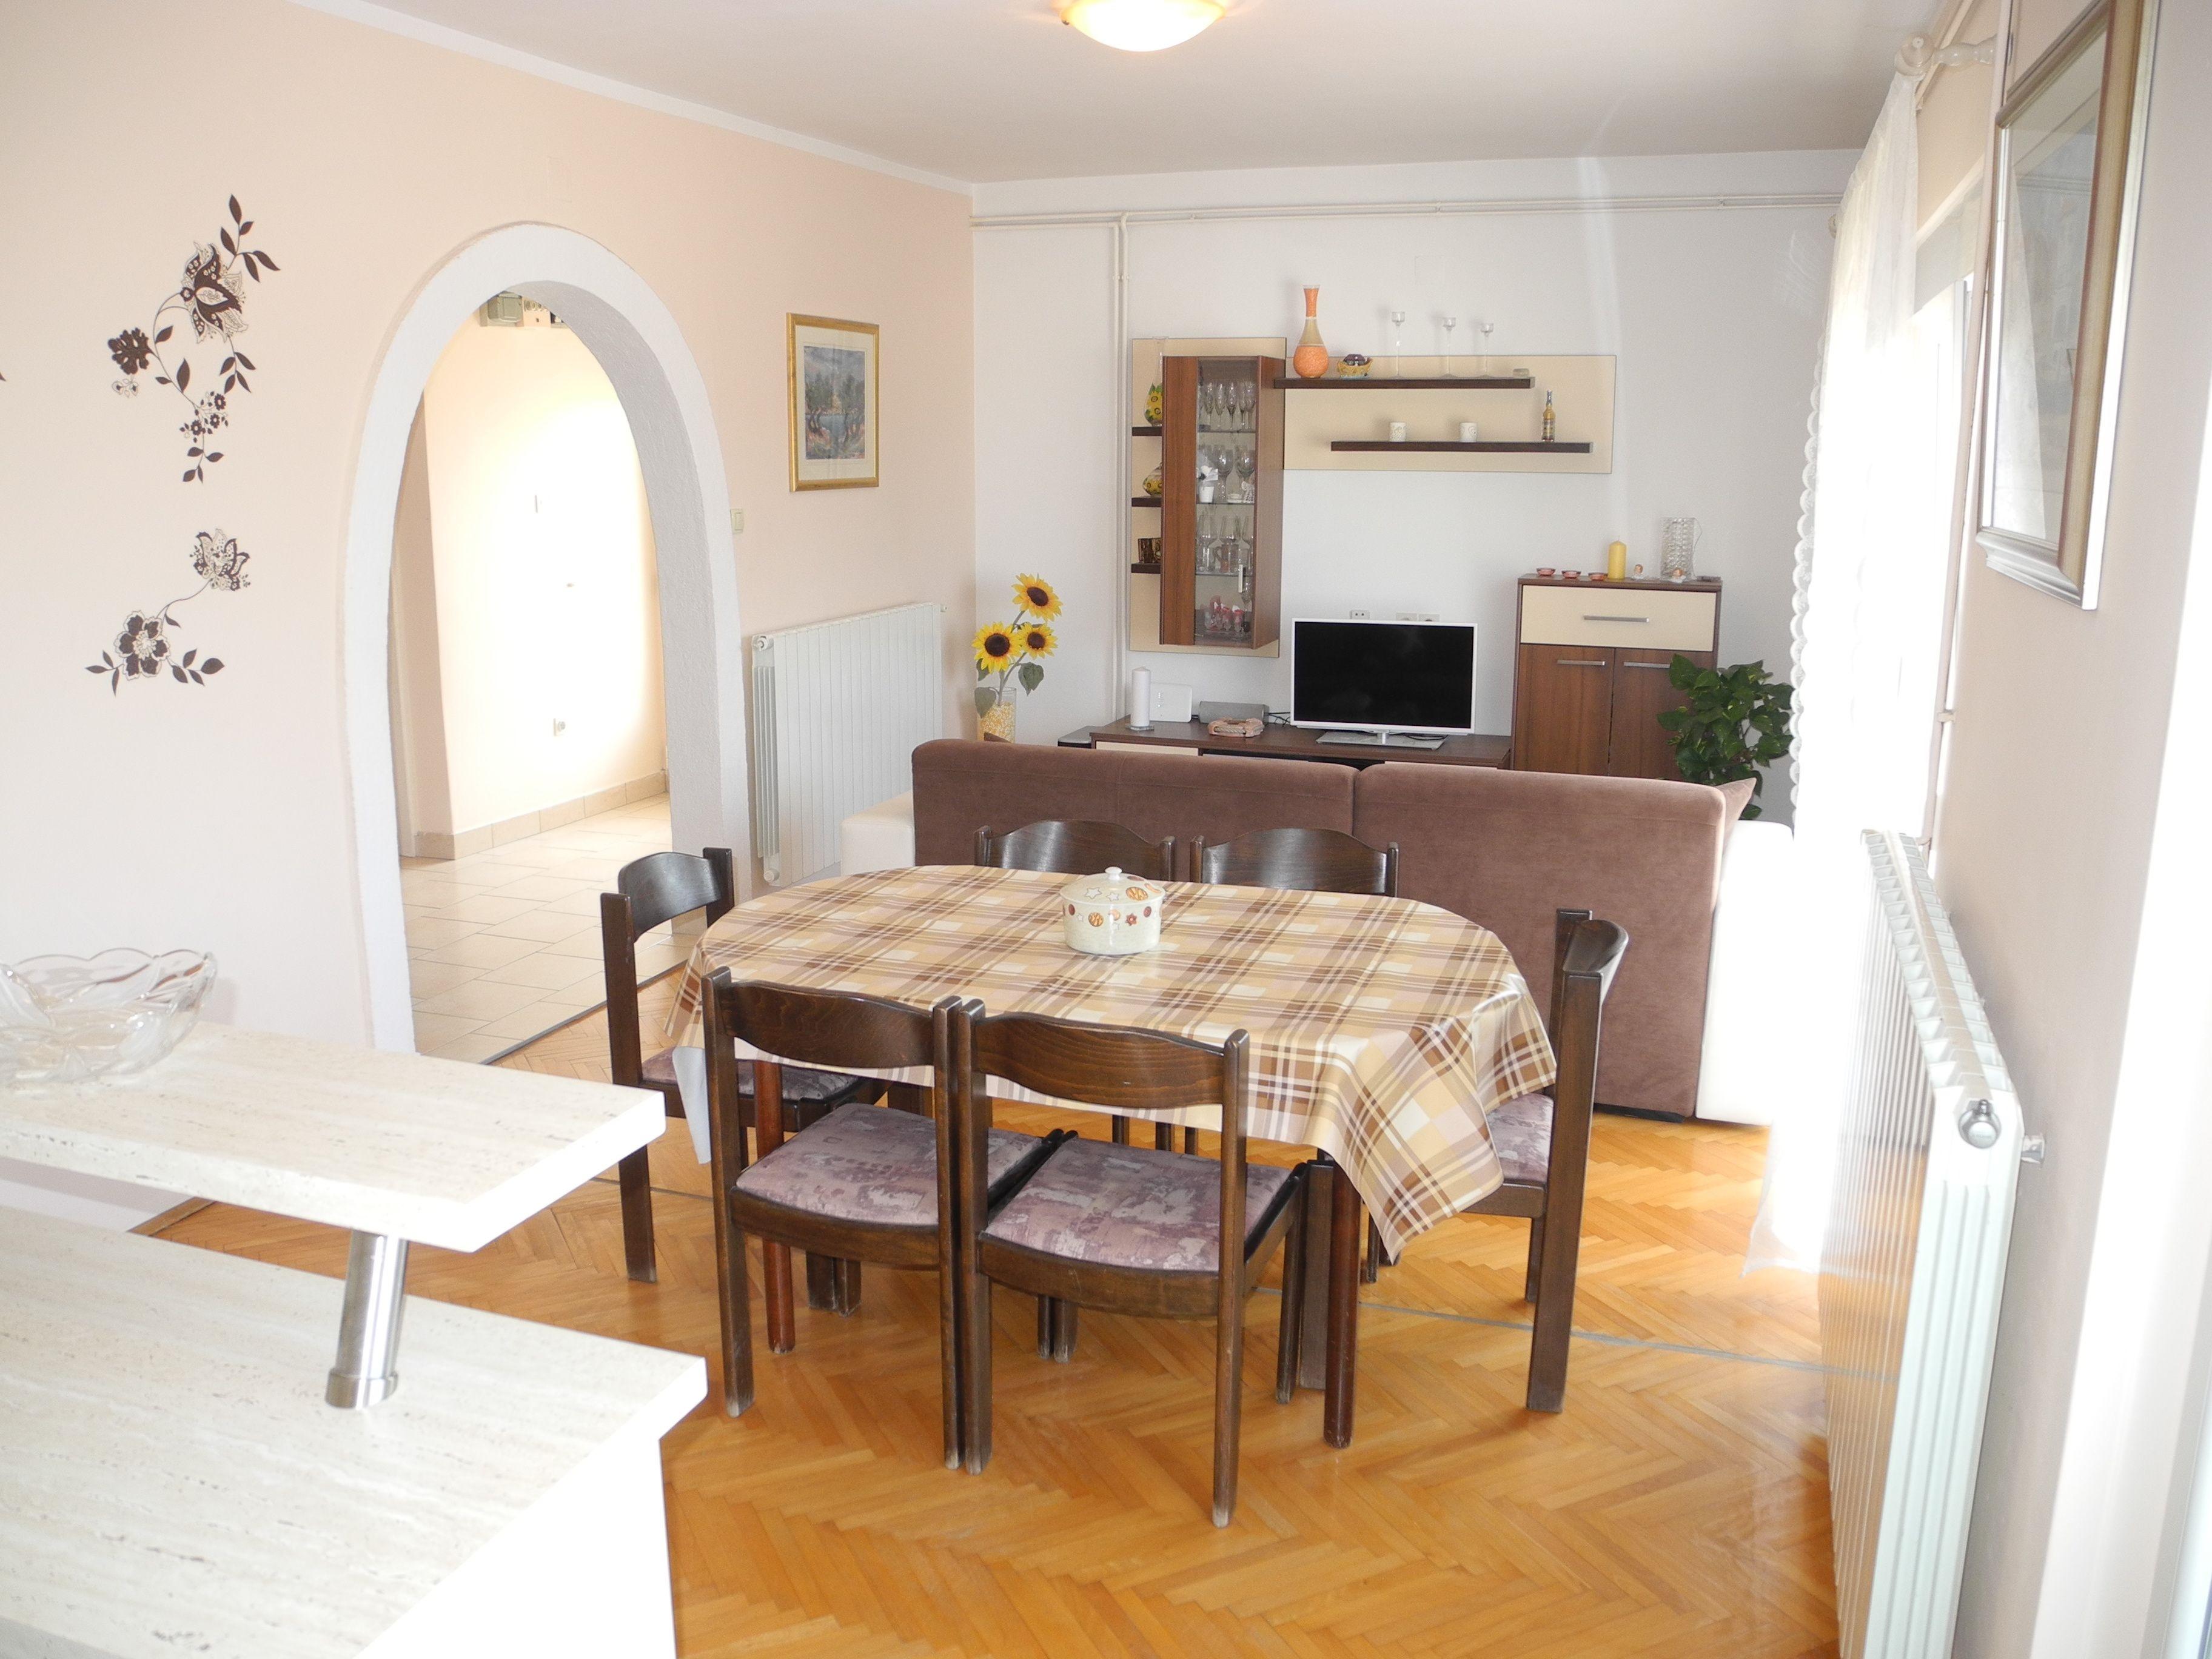 Apartment 2 Anamarija 4+1 pax